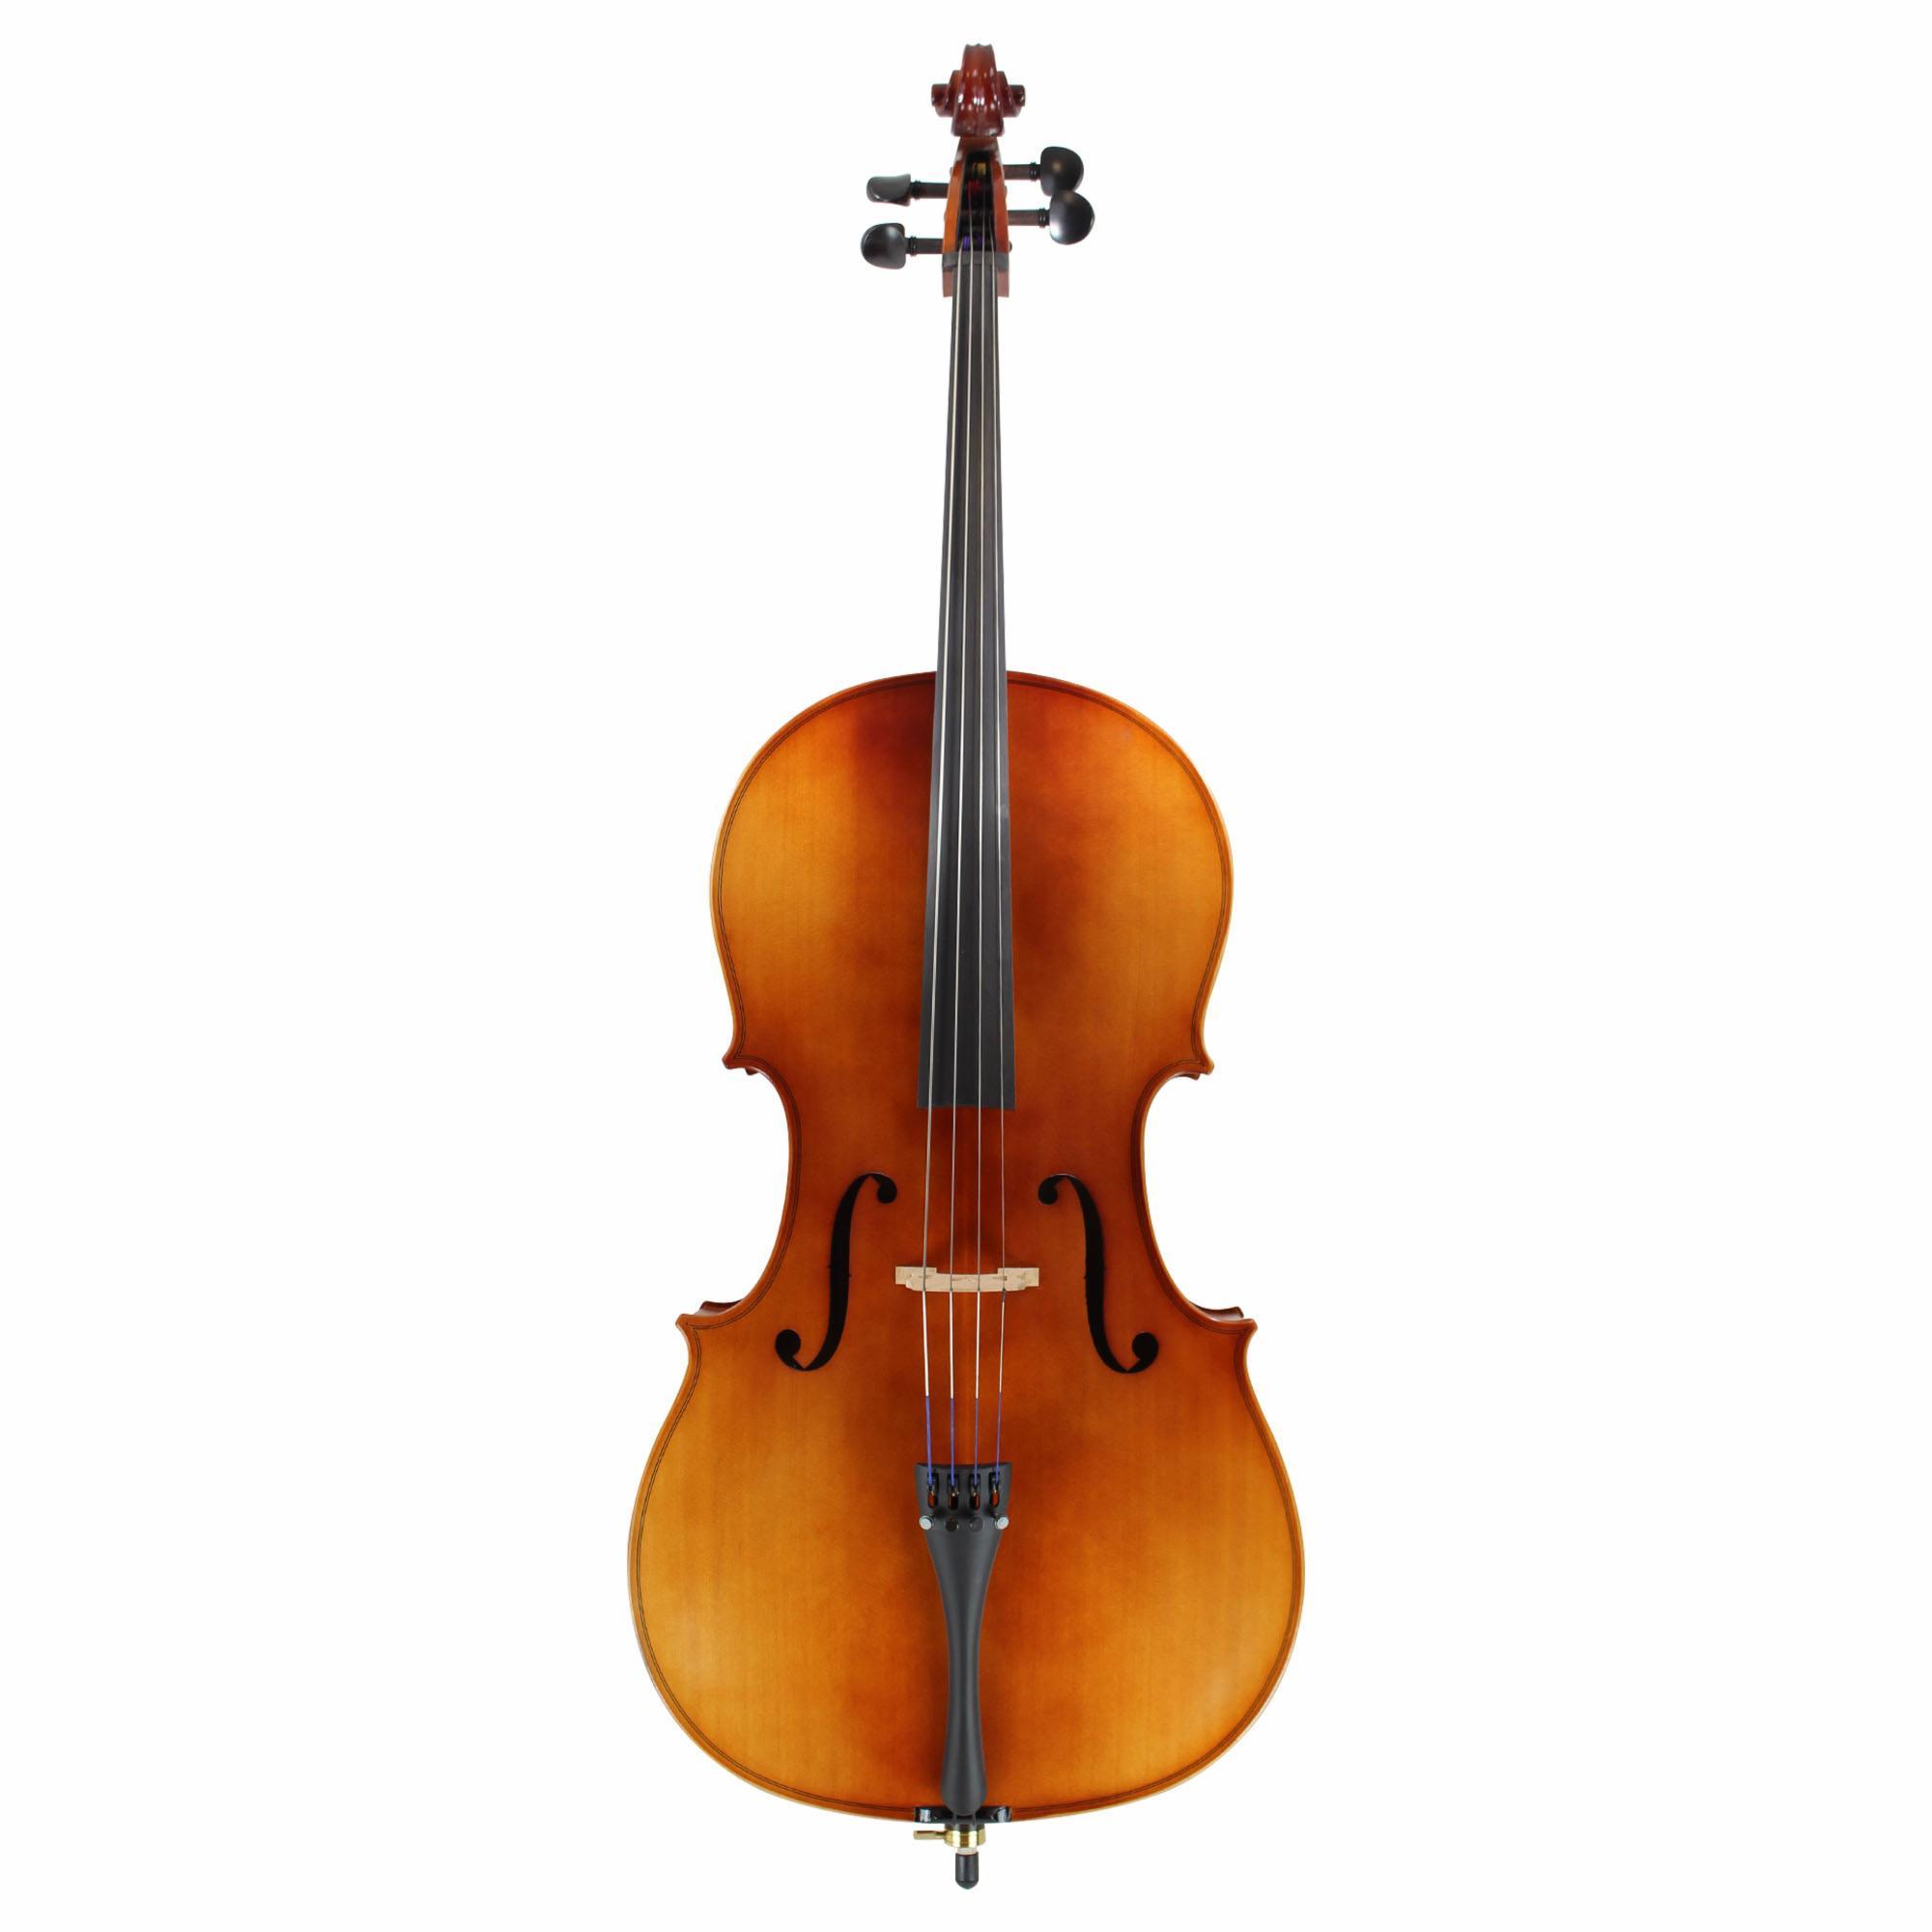 Cello Net Worth